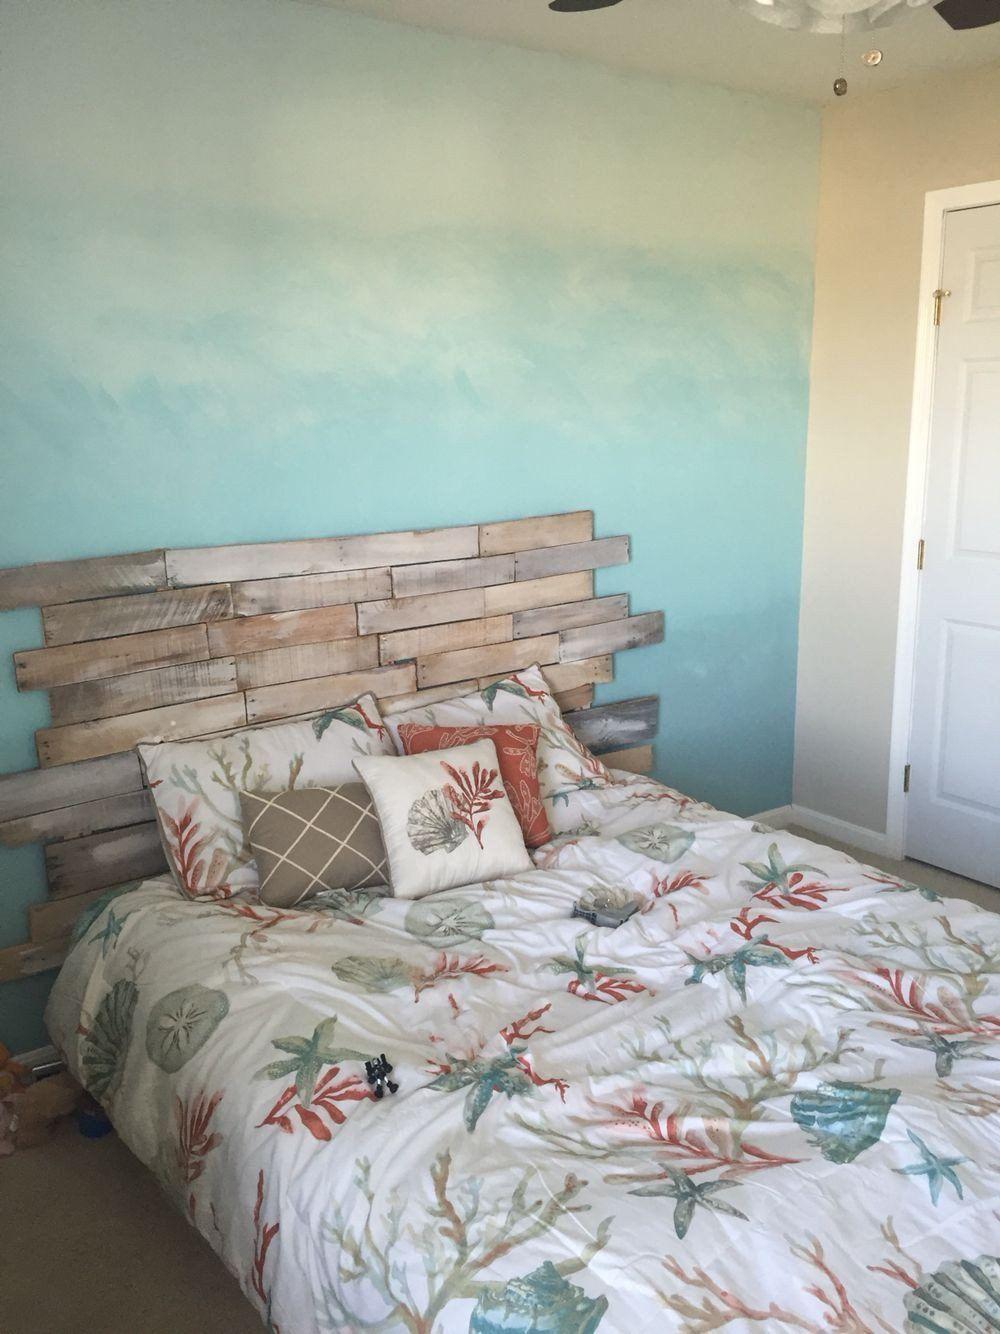 Beach Themed Bedroom Decor Best Of Ombre Ocean Wall Pallet Headboard For A Beach Themed Room Dekorasi Kamar Tidur Buatan Sendiri Dekor Kamar Tidur